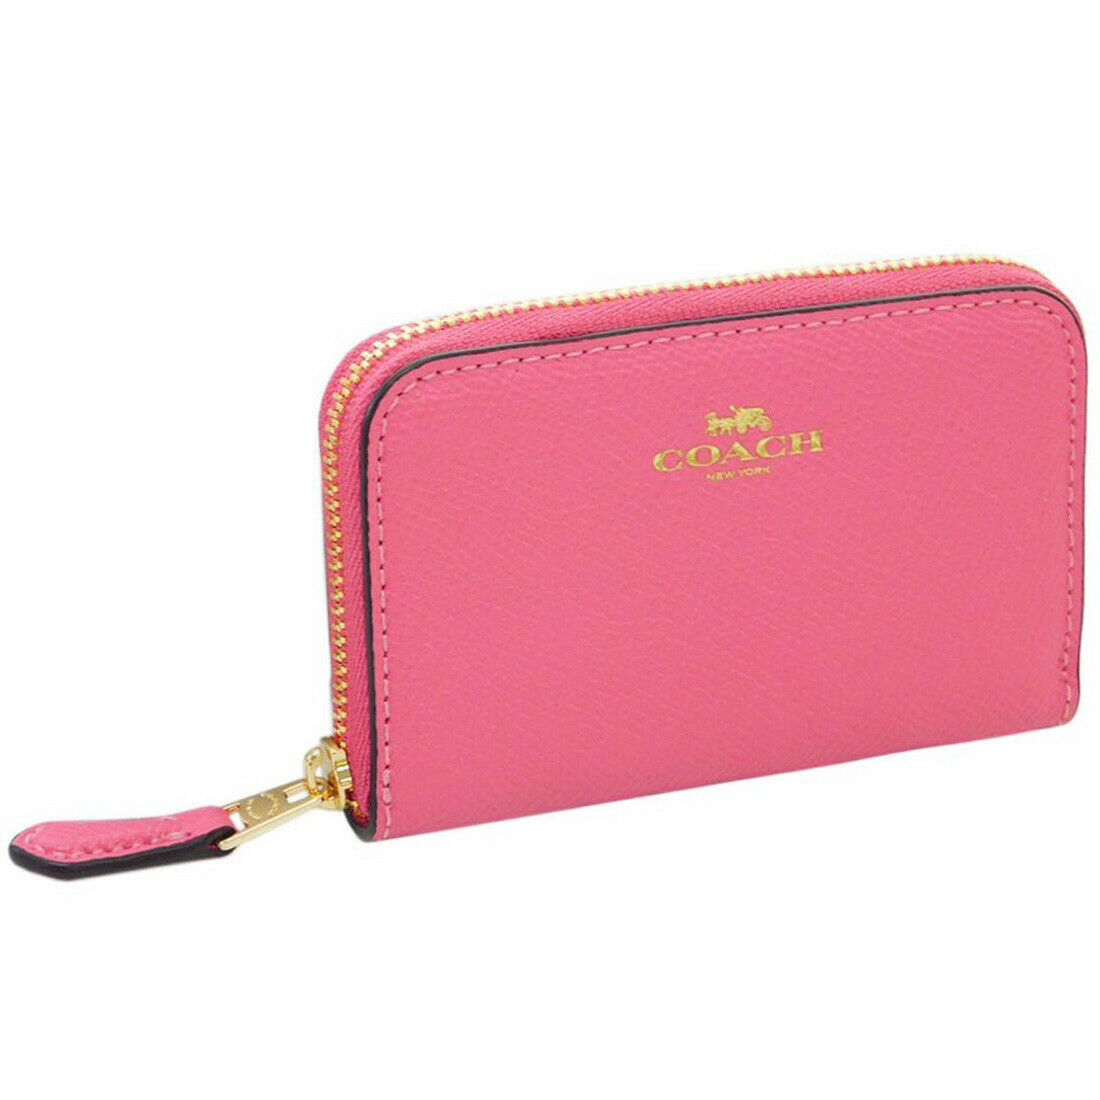 NWT Coach F11484 Medium Corner Zip Snap Wallet Crossgrain Leather Carnation Pink